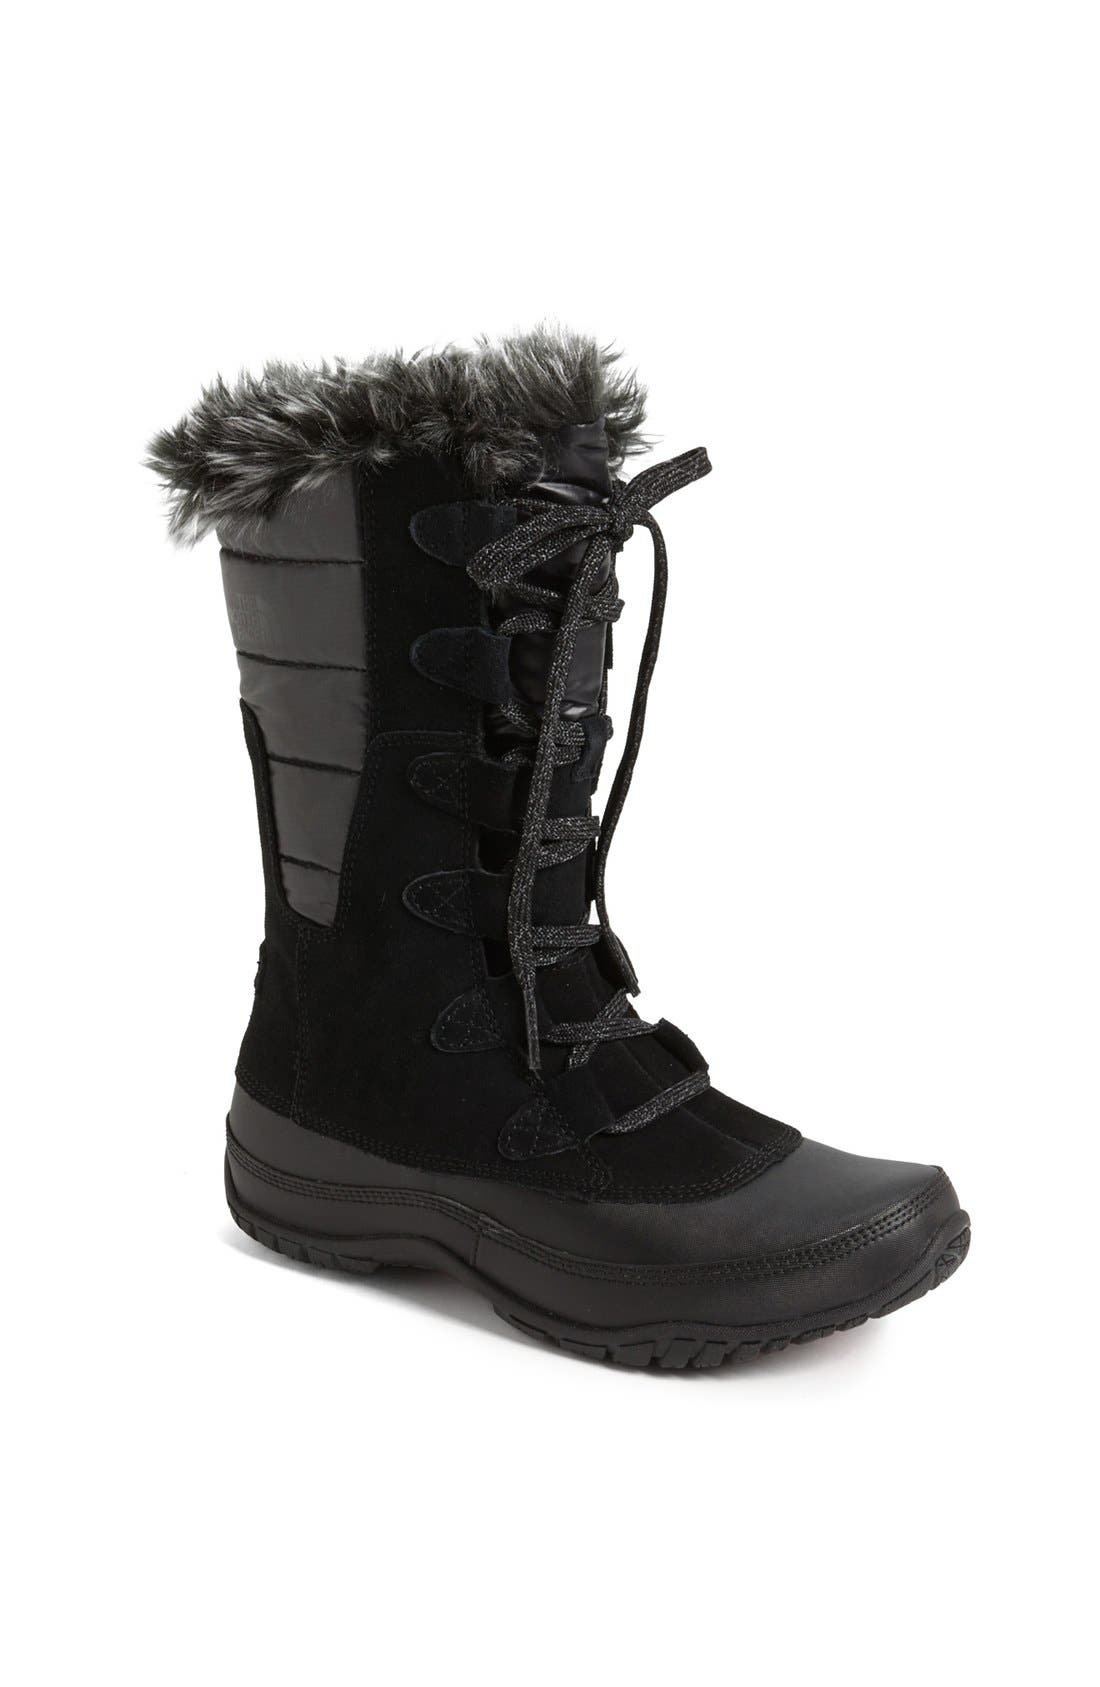 'Nuptse Purna' Waterproof PrimaLoft<sup>®</sup> Eco Insulated Winter Boot,                             Main thumbnail 1, color,                             001